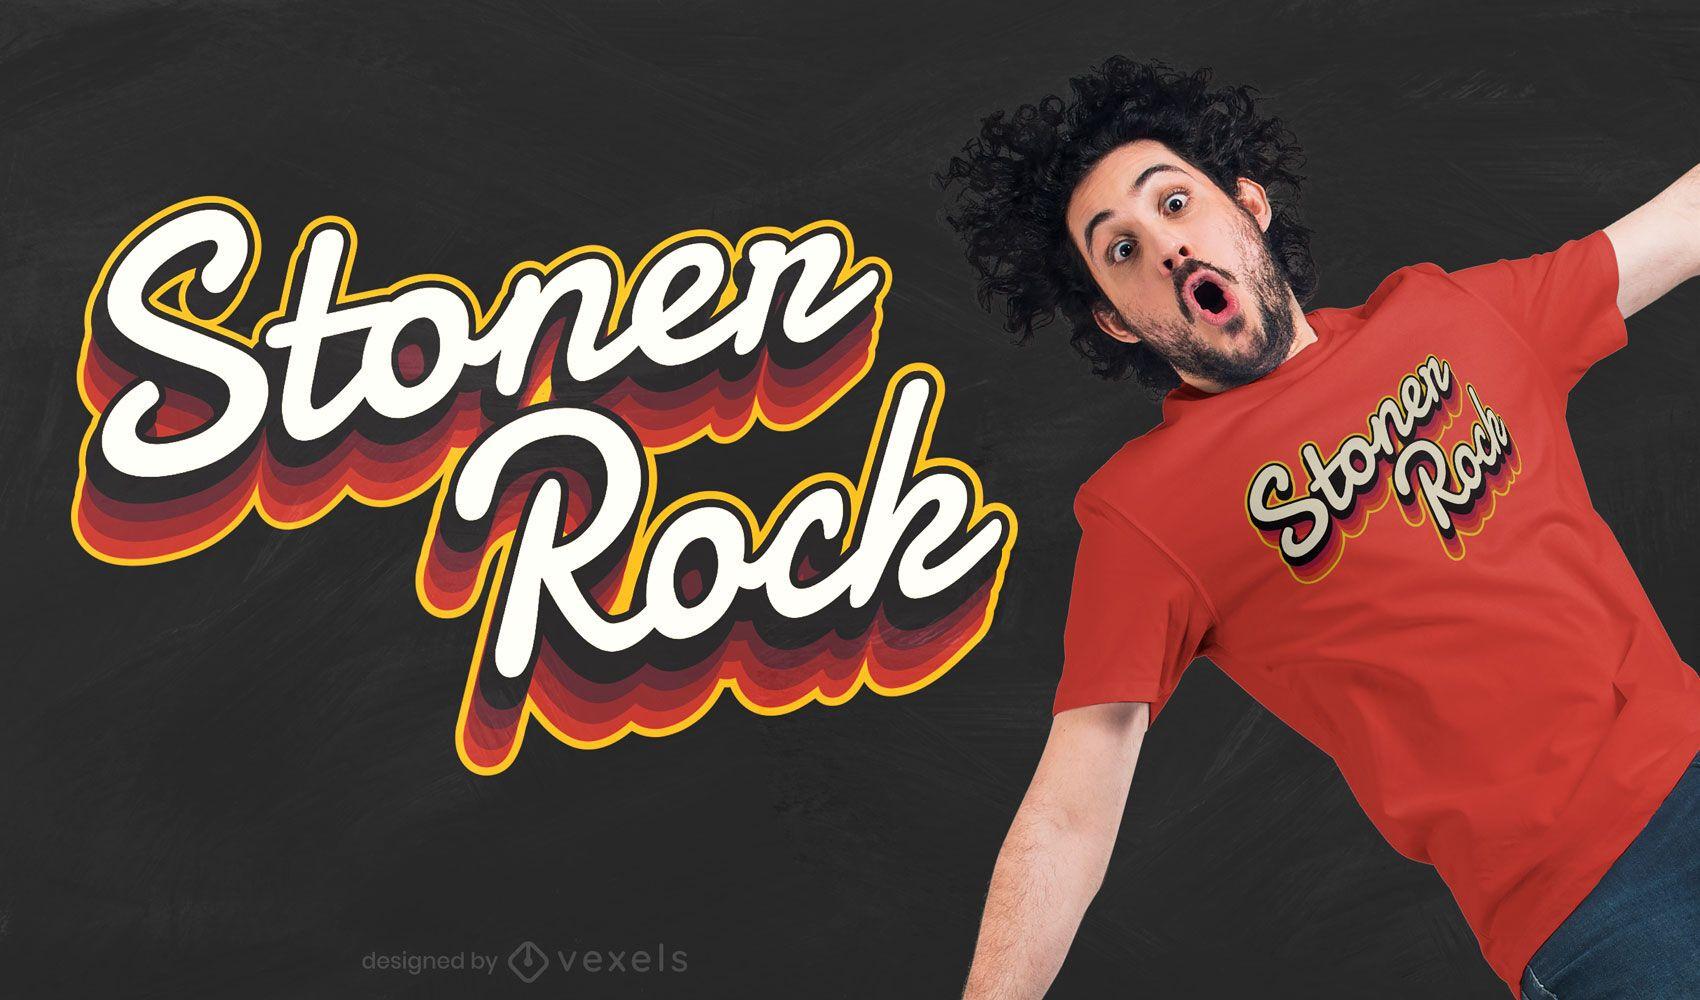 Design de t-shirt Stoner rock